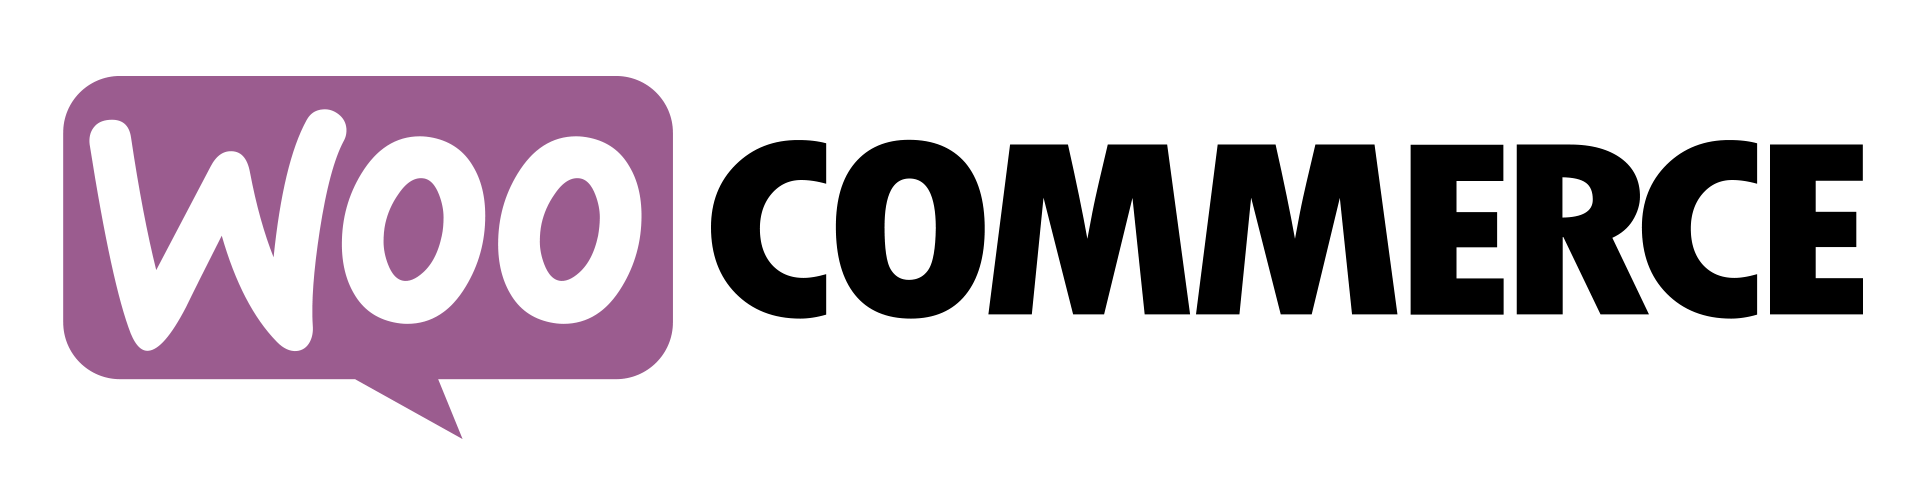 woocommerce logotipo